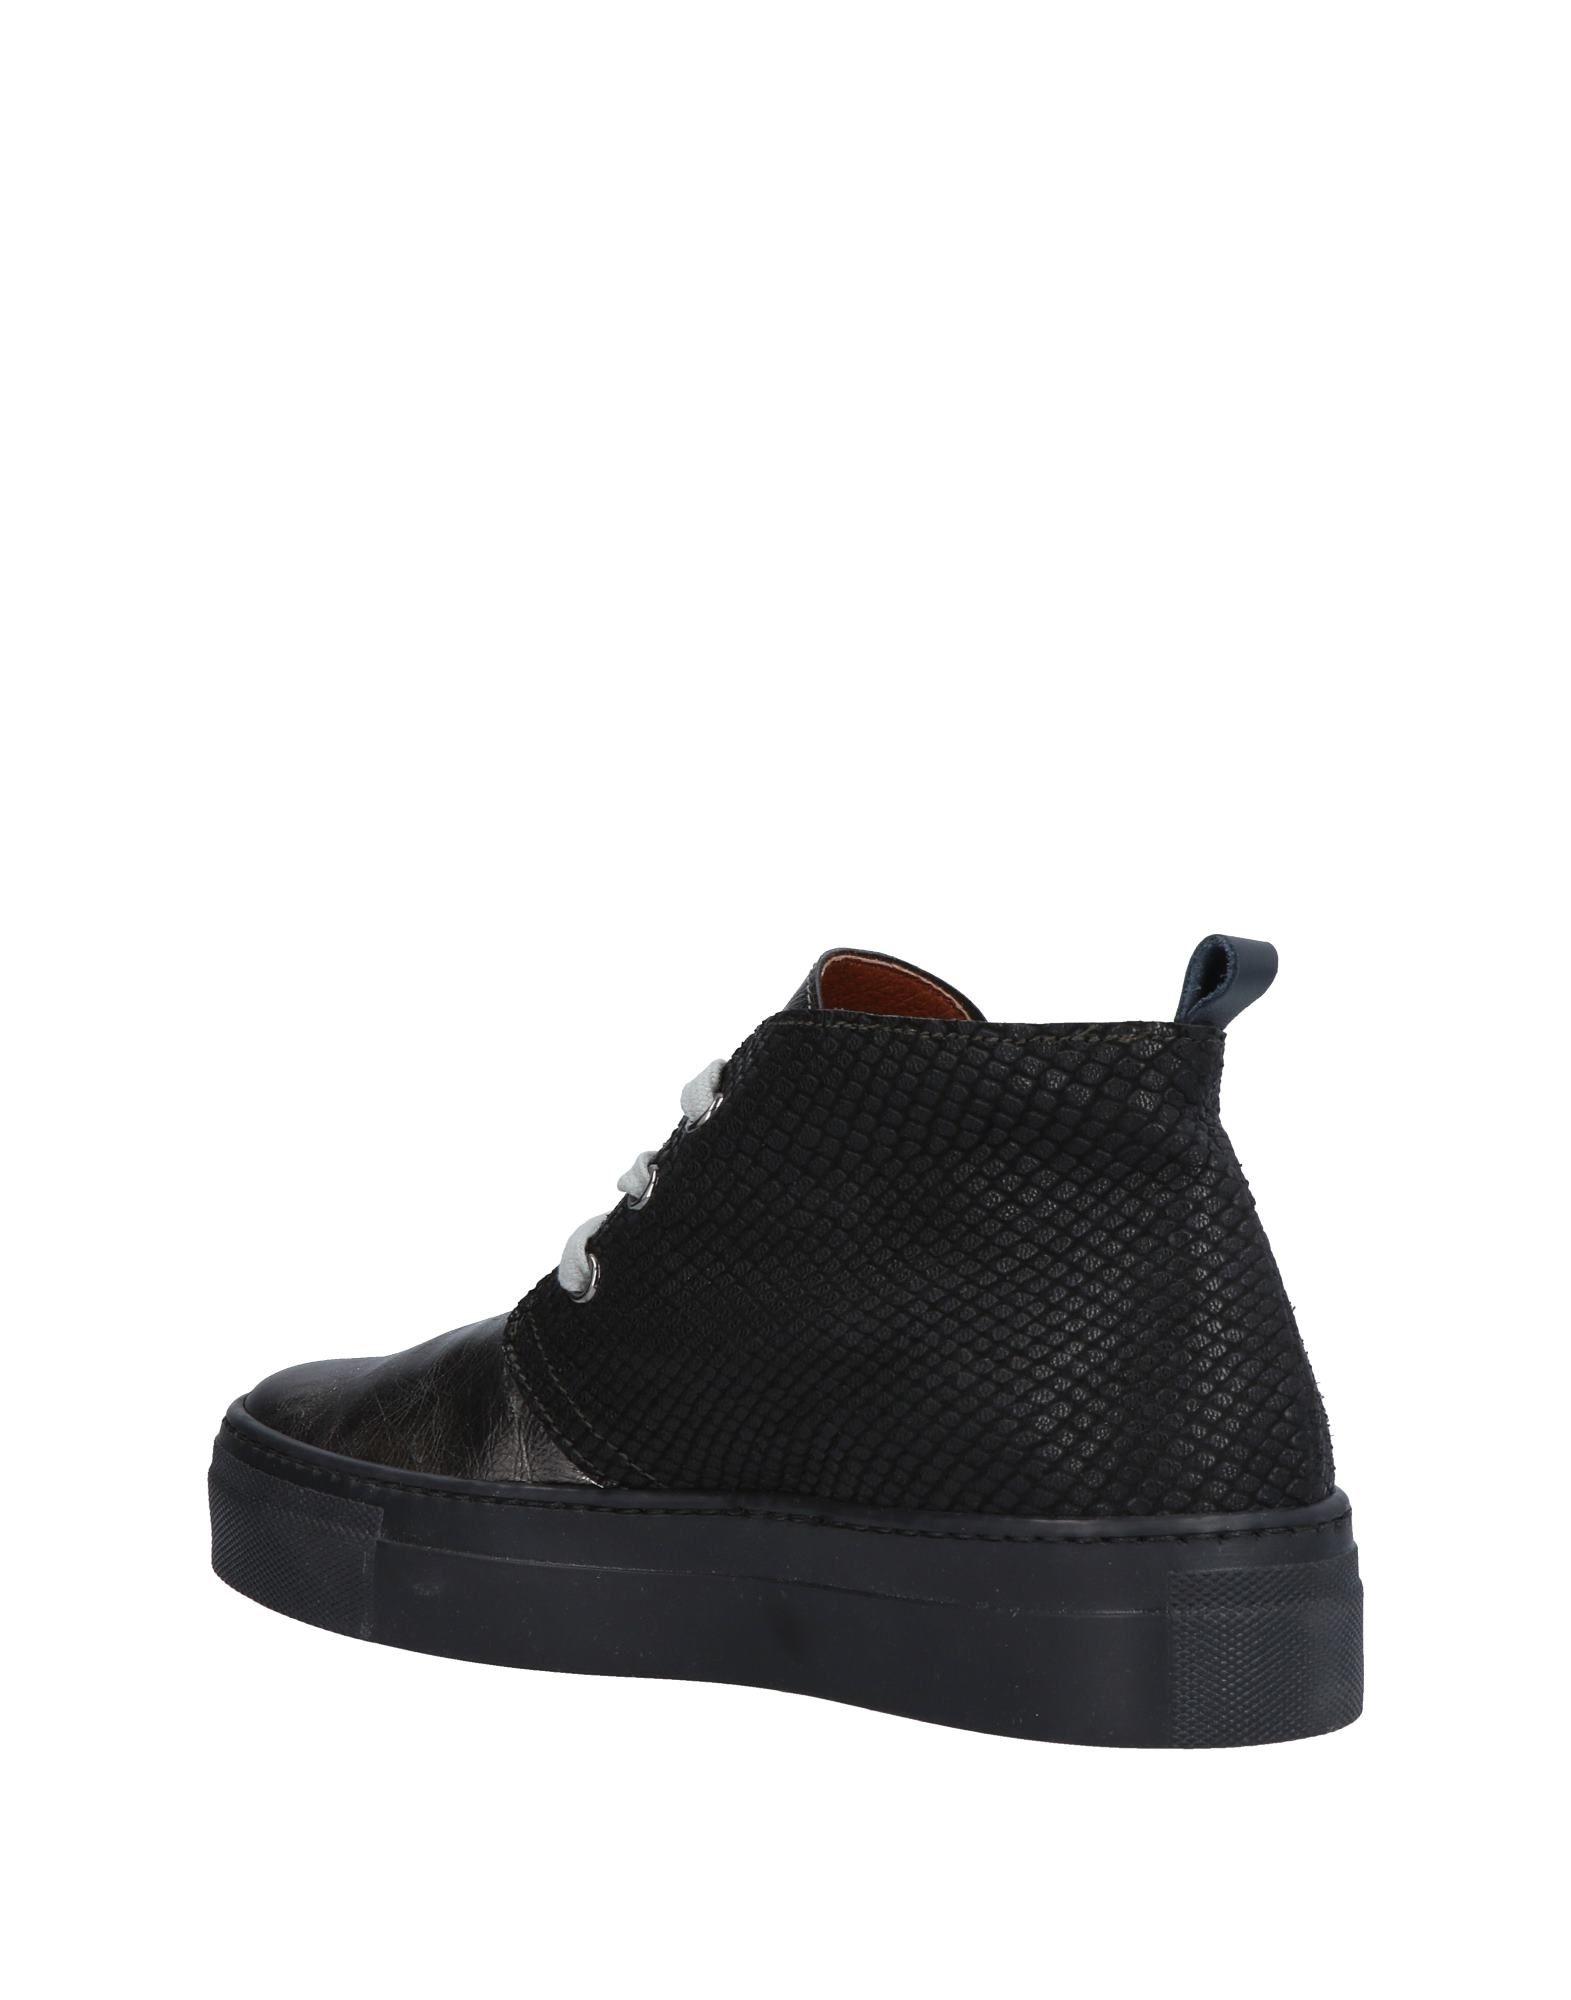 Ebarrito Sneakers Damen beliebte  11464846CP Gute Qualität beliebte Damen Schuhe 1129f1